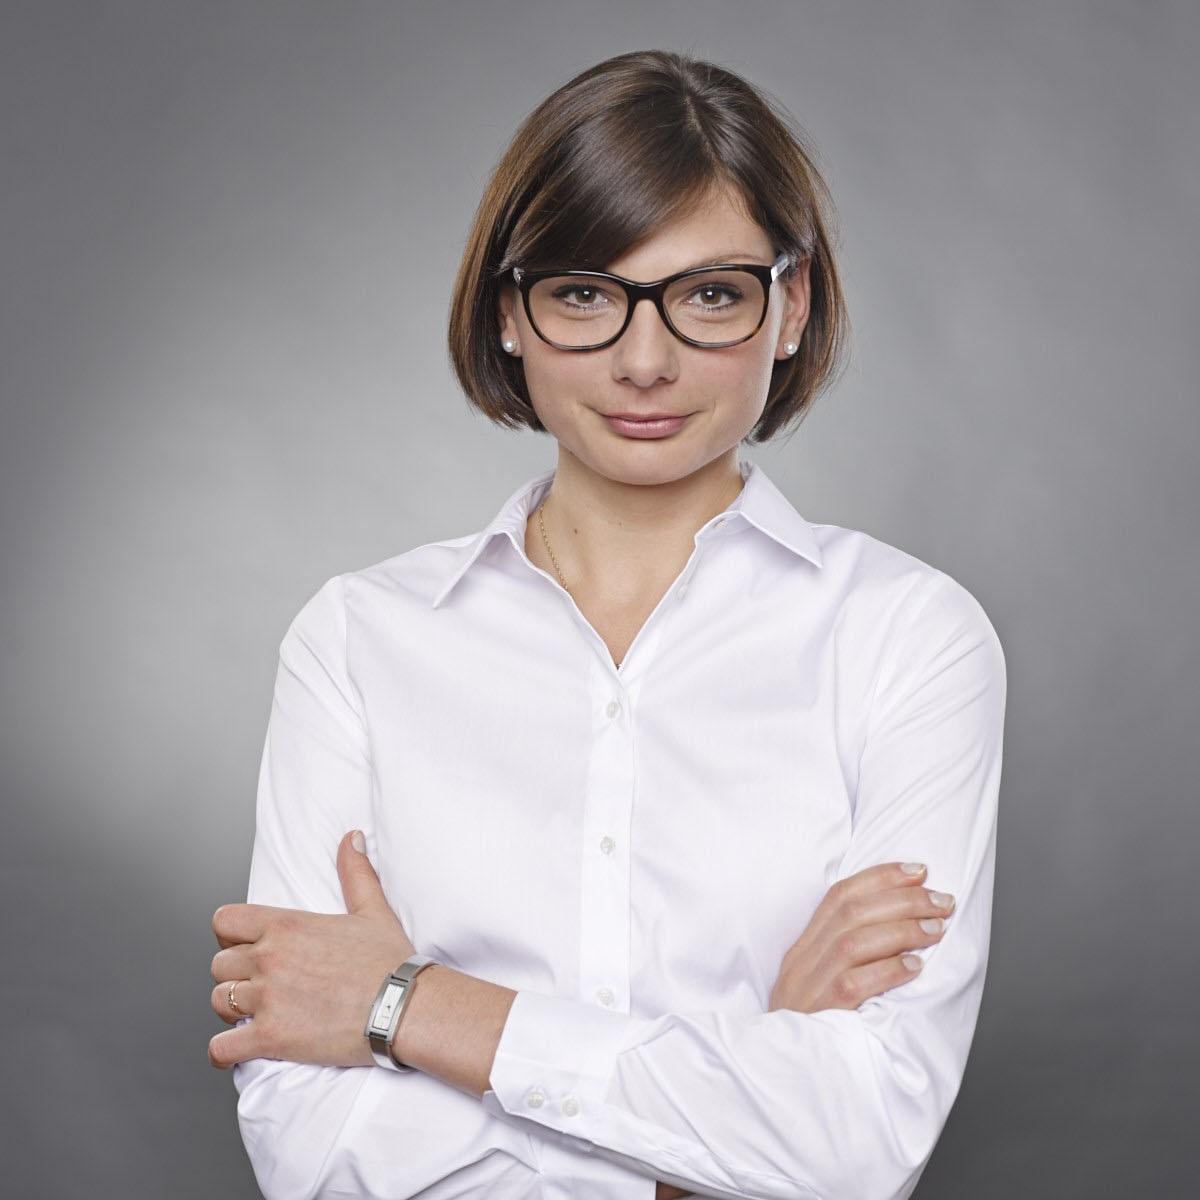 Joanna Bartos